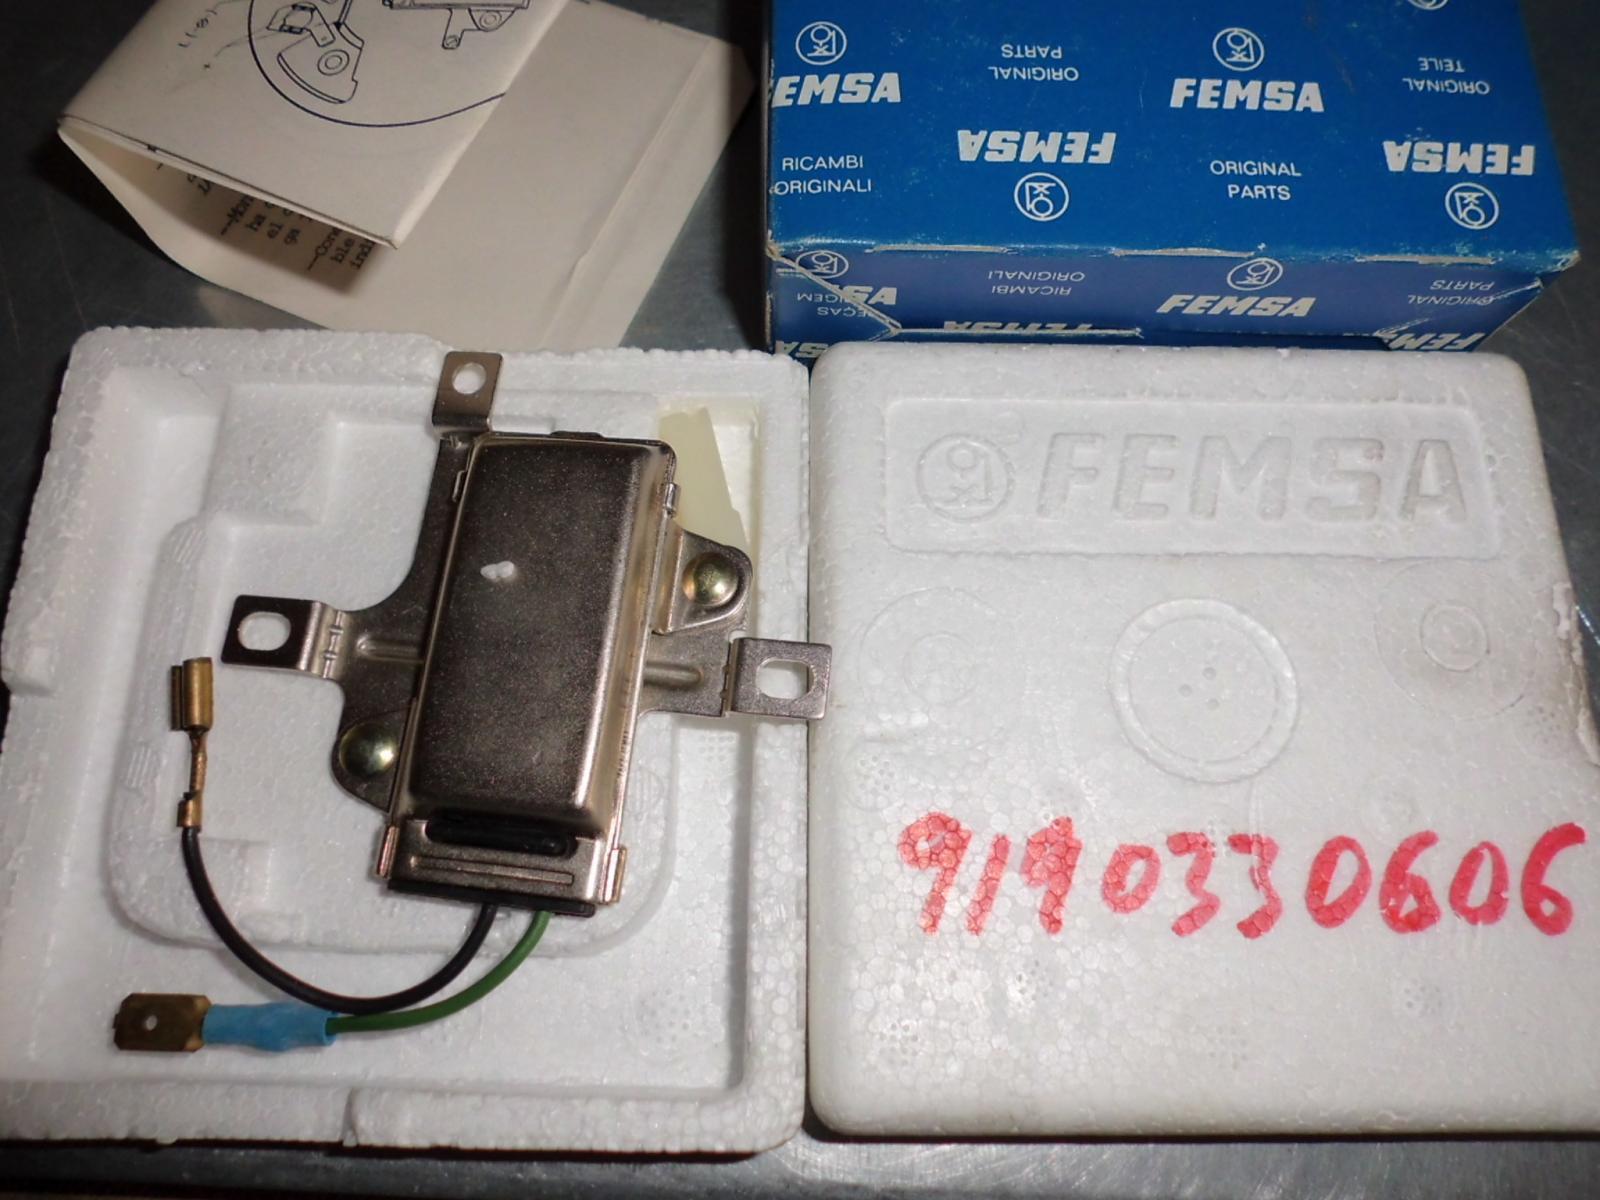 Regulador Ford marca Femsa